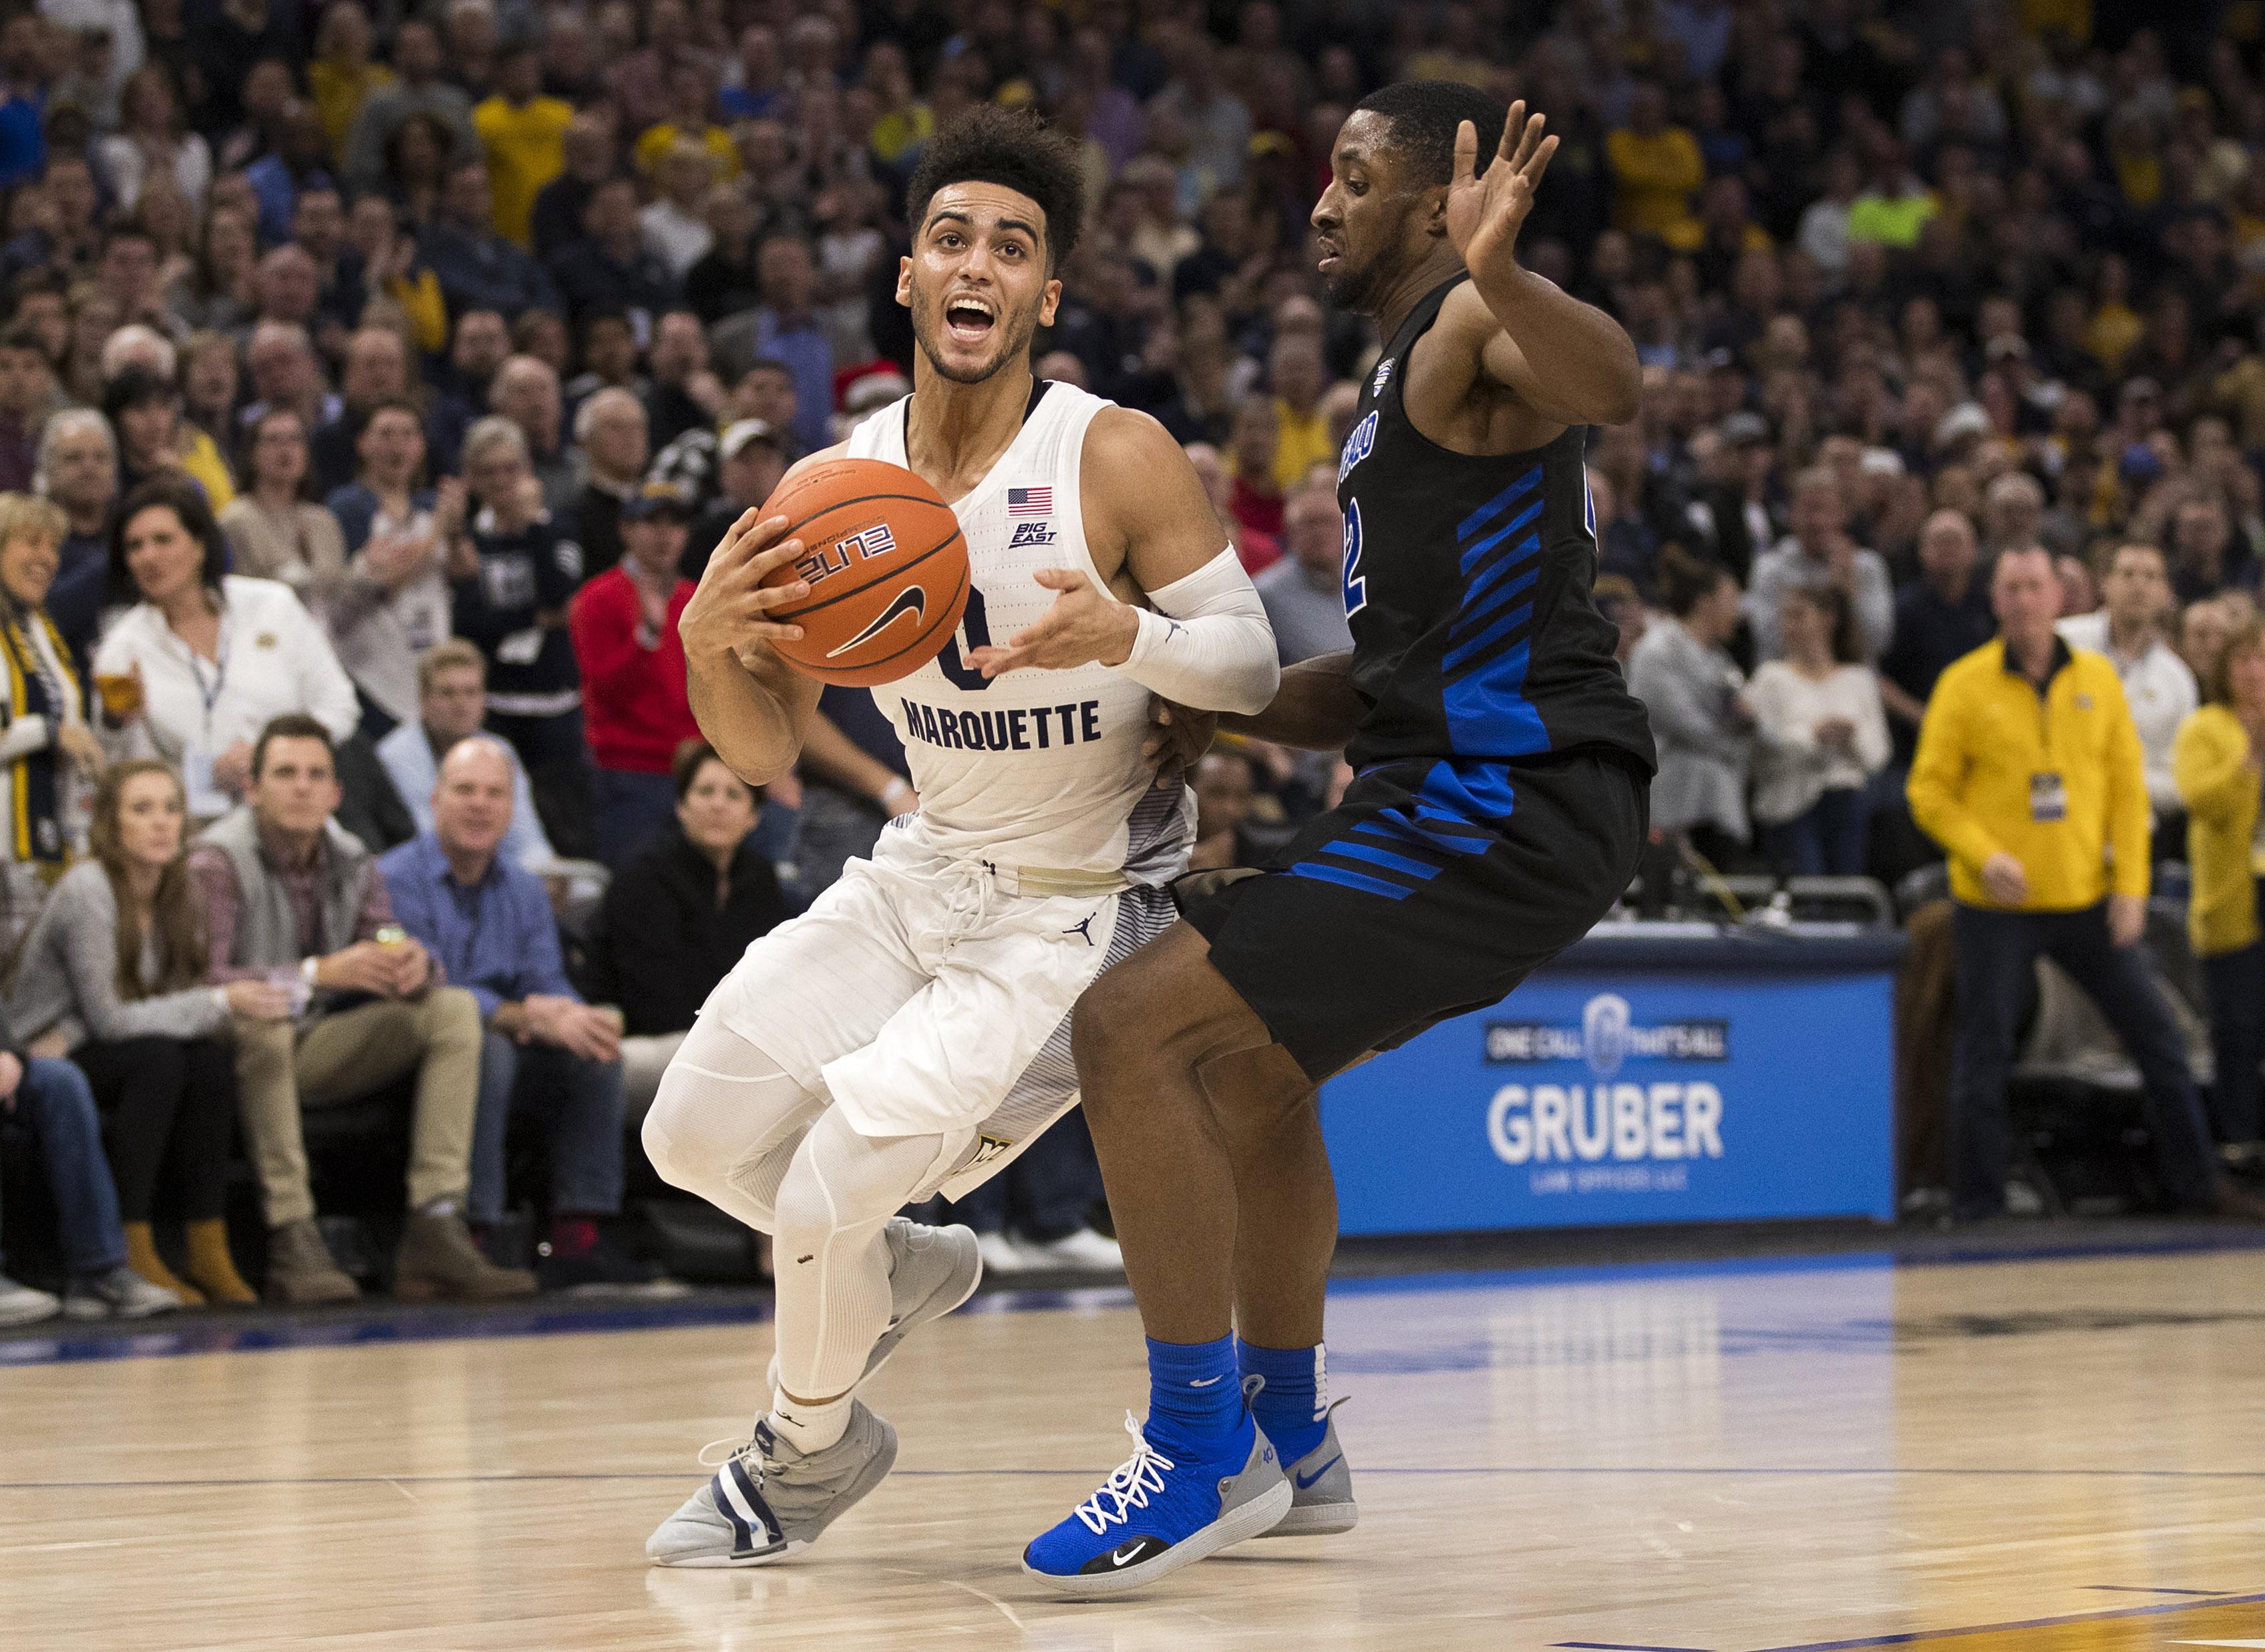 NCAA Basketball: Buffalo at Marquette